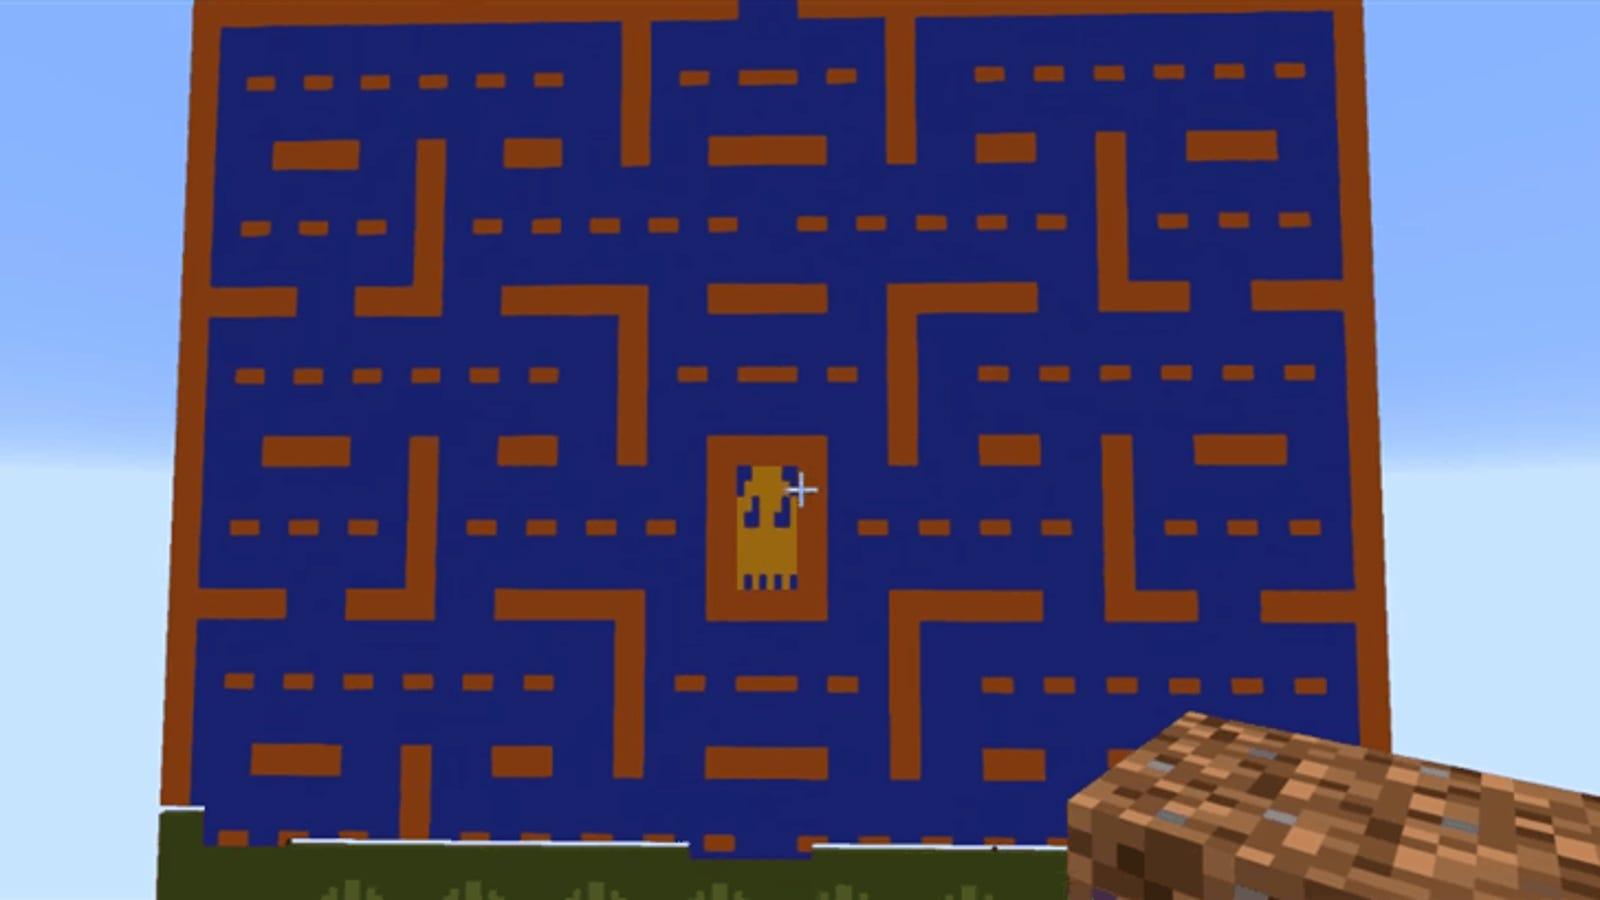 Consiguen crear un emulador de Atari 2600 dentro de Minecraft completamente funcional